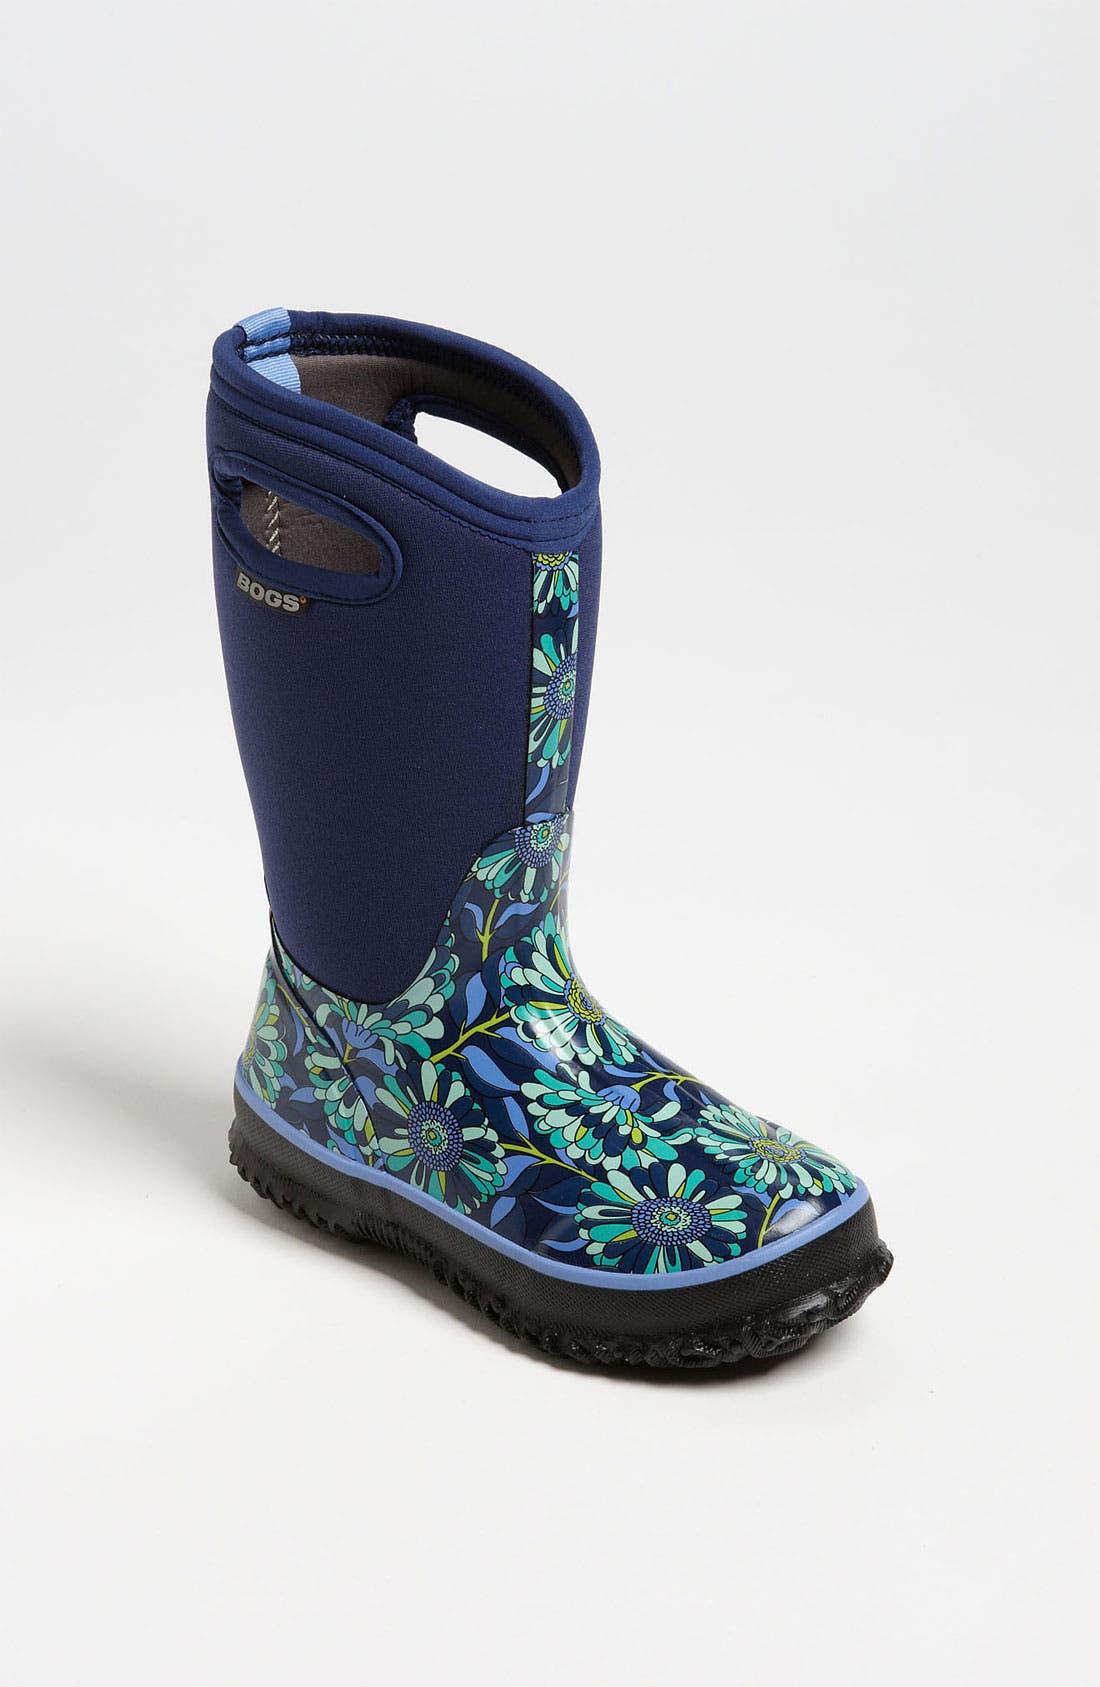 Main Image - Bogs 'Classic High - Mumsie' Waterproof Boot (Toddler, Little Kid & Big Kid)